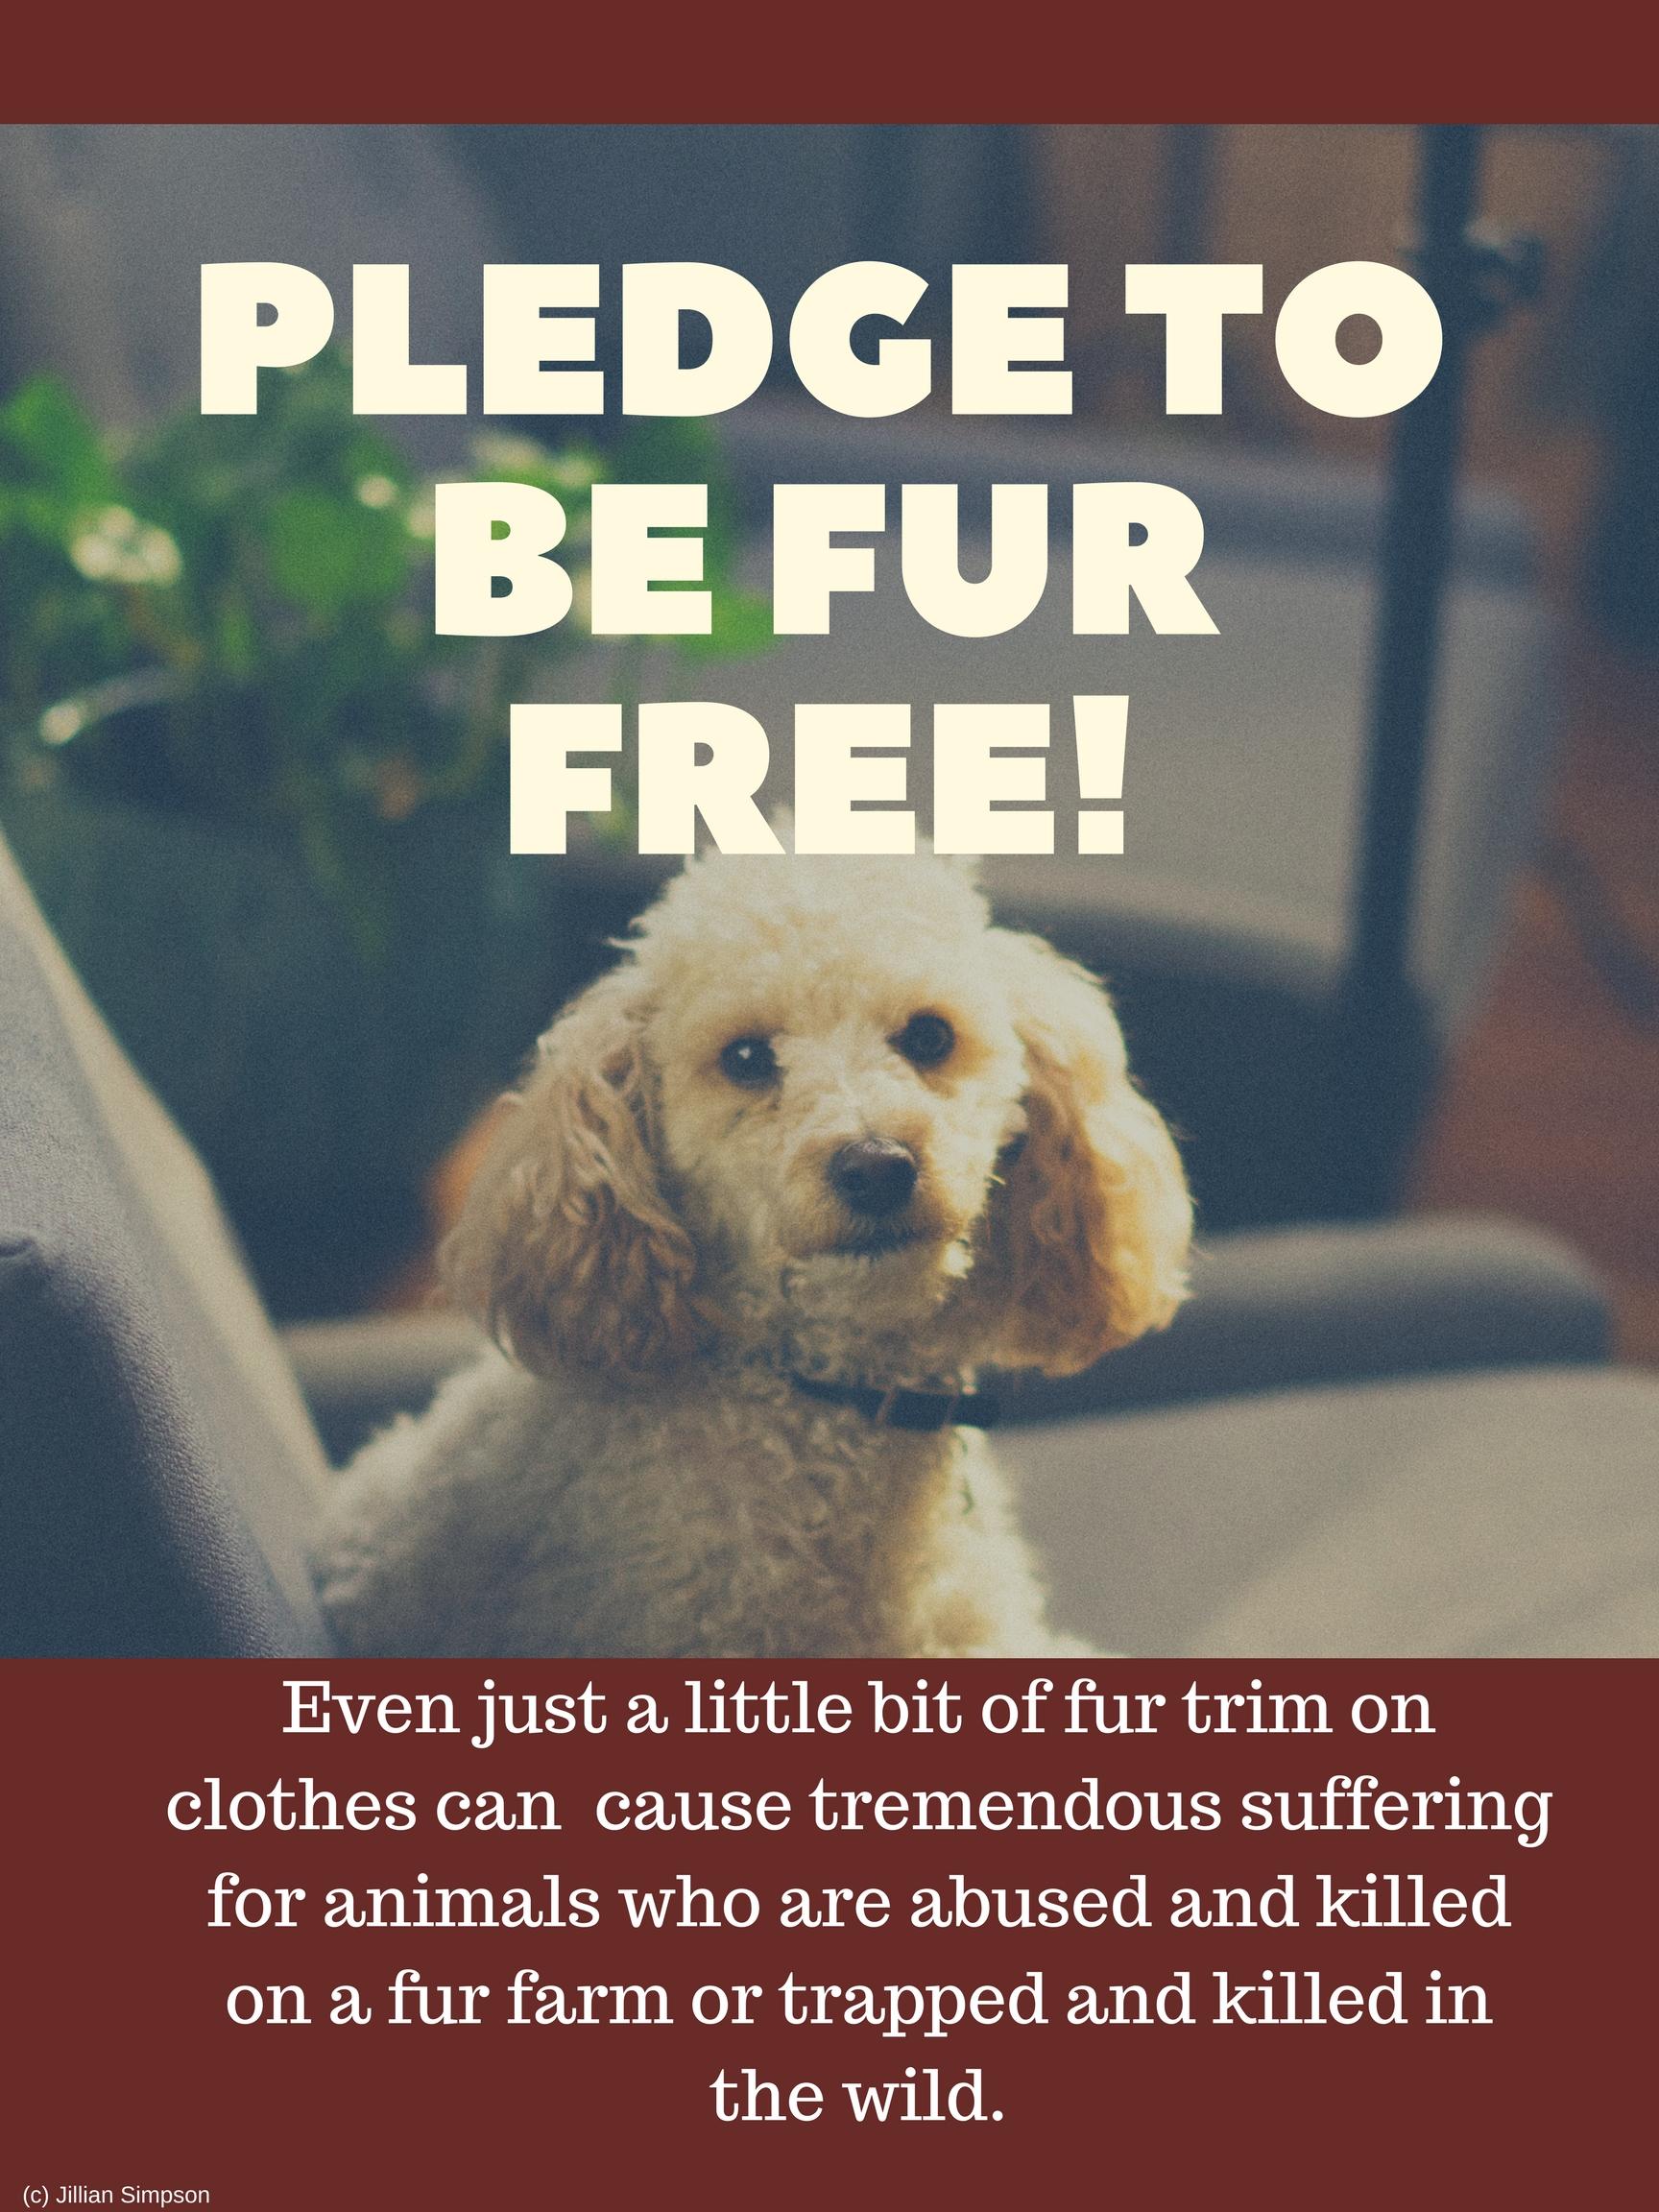 pledge to be fur free!